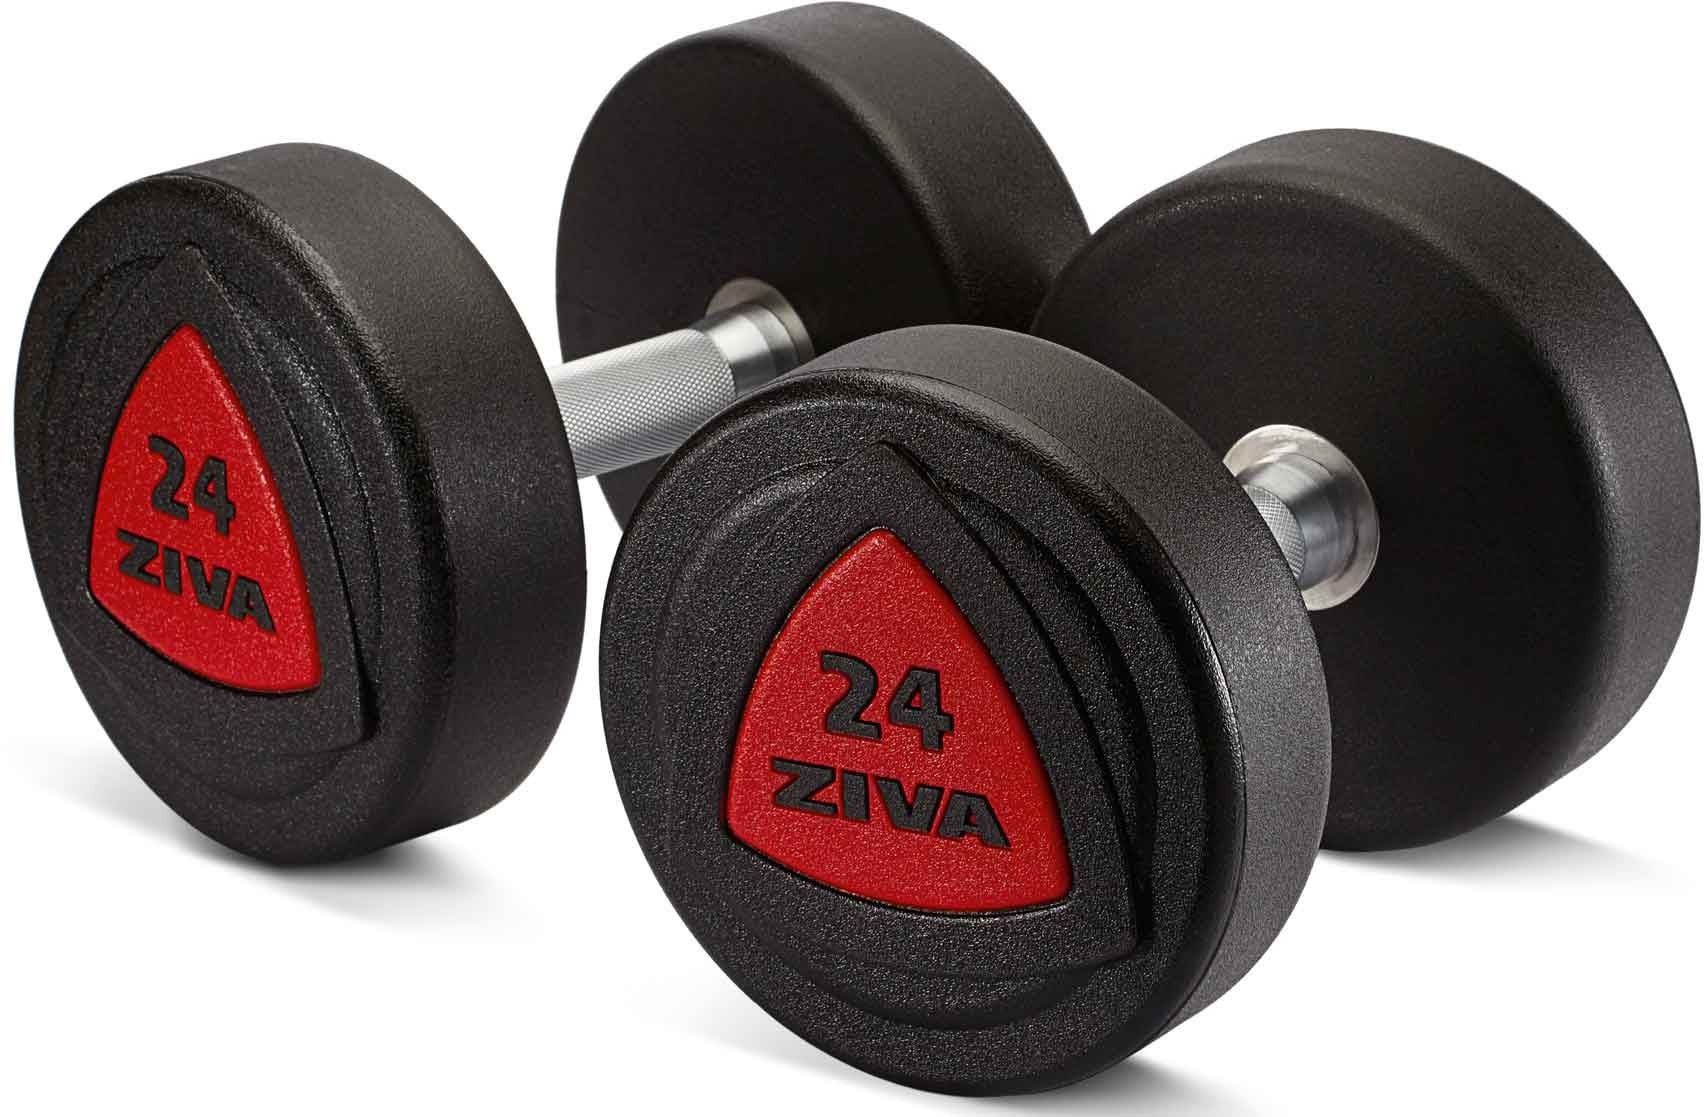 Gewichte Fitness Studio Krafttraining Rehe Kurzhantel Kunst 2 Hanteln 1 Paar